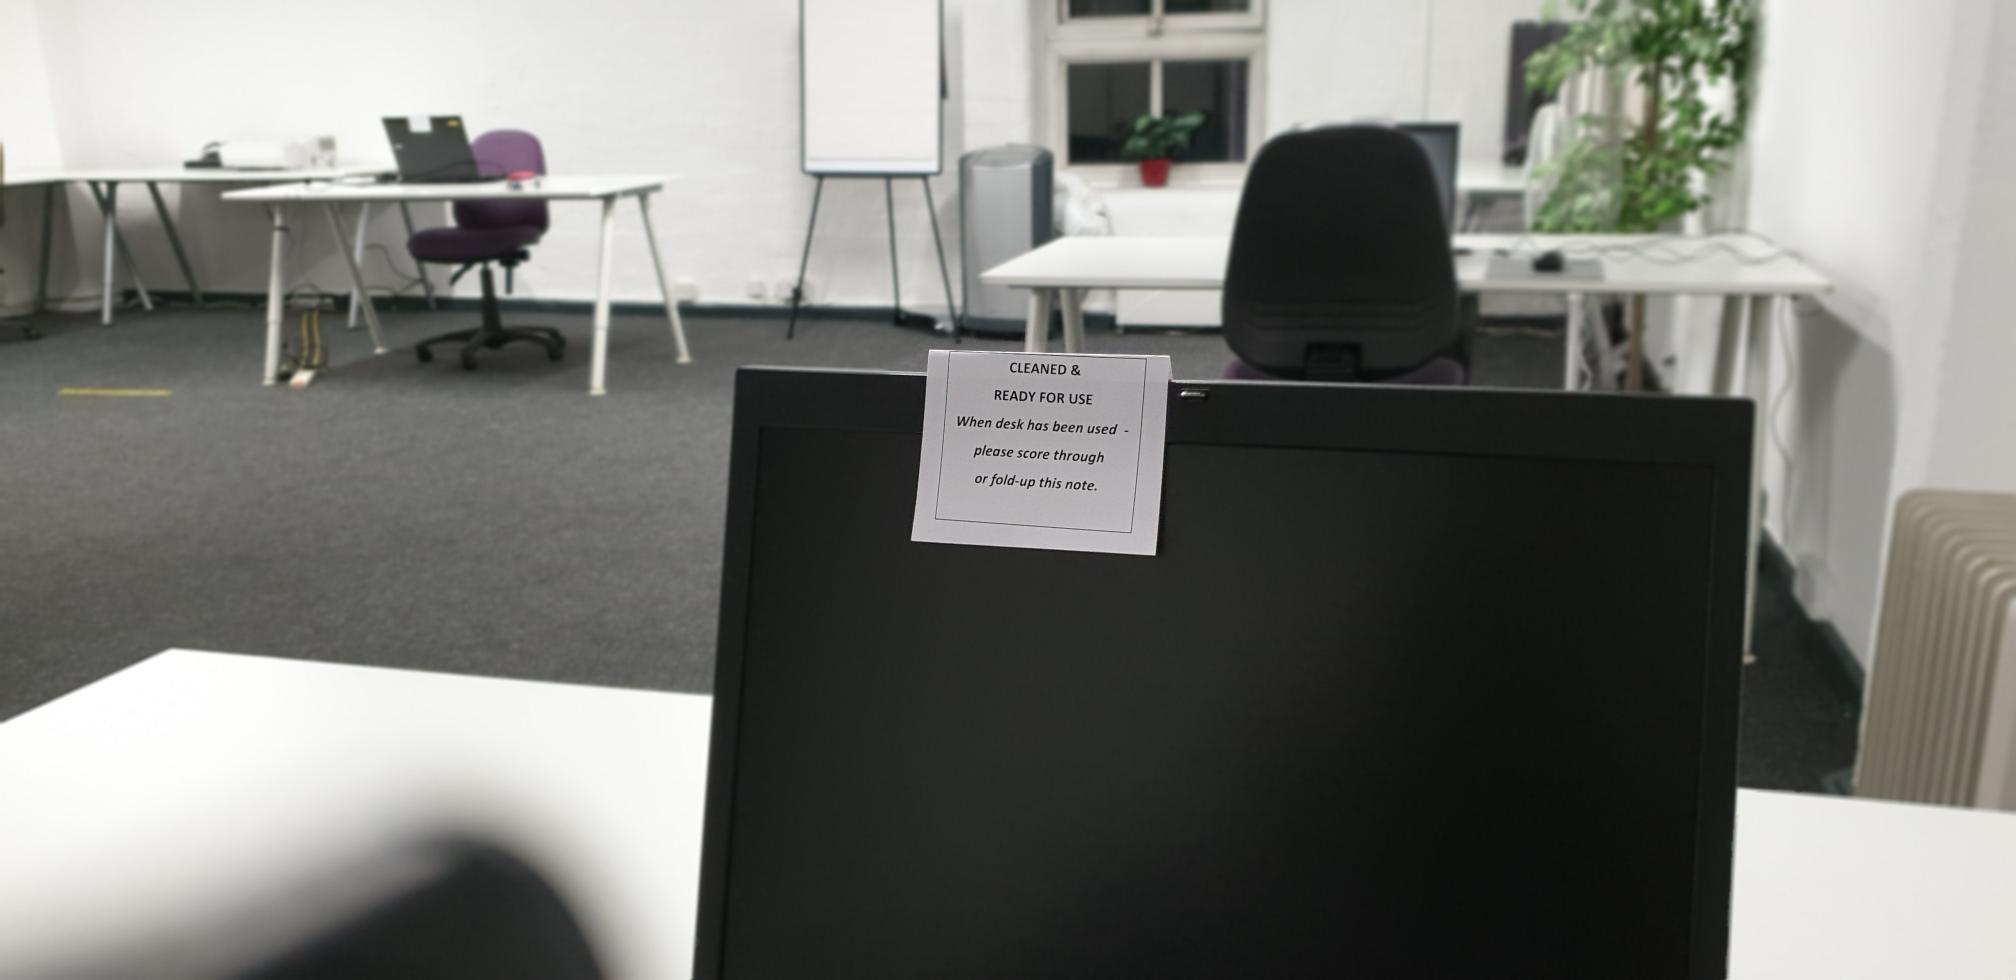 Delegte view of laptop training room